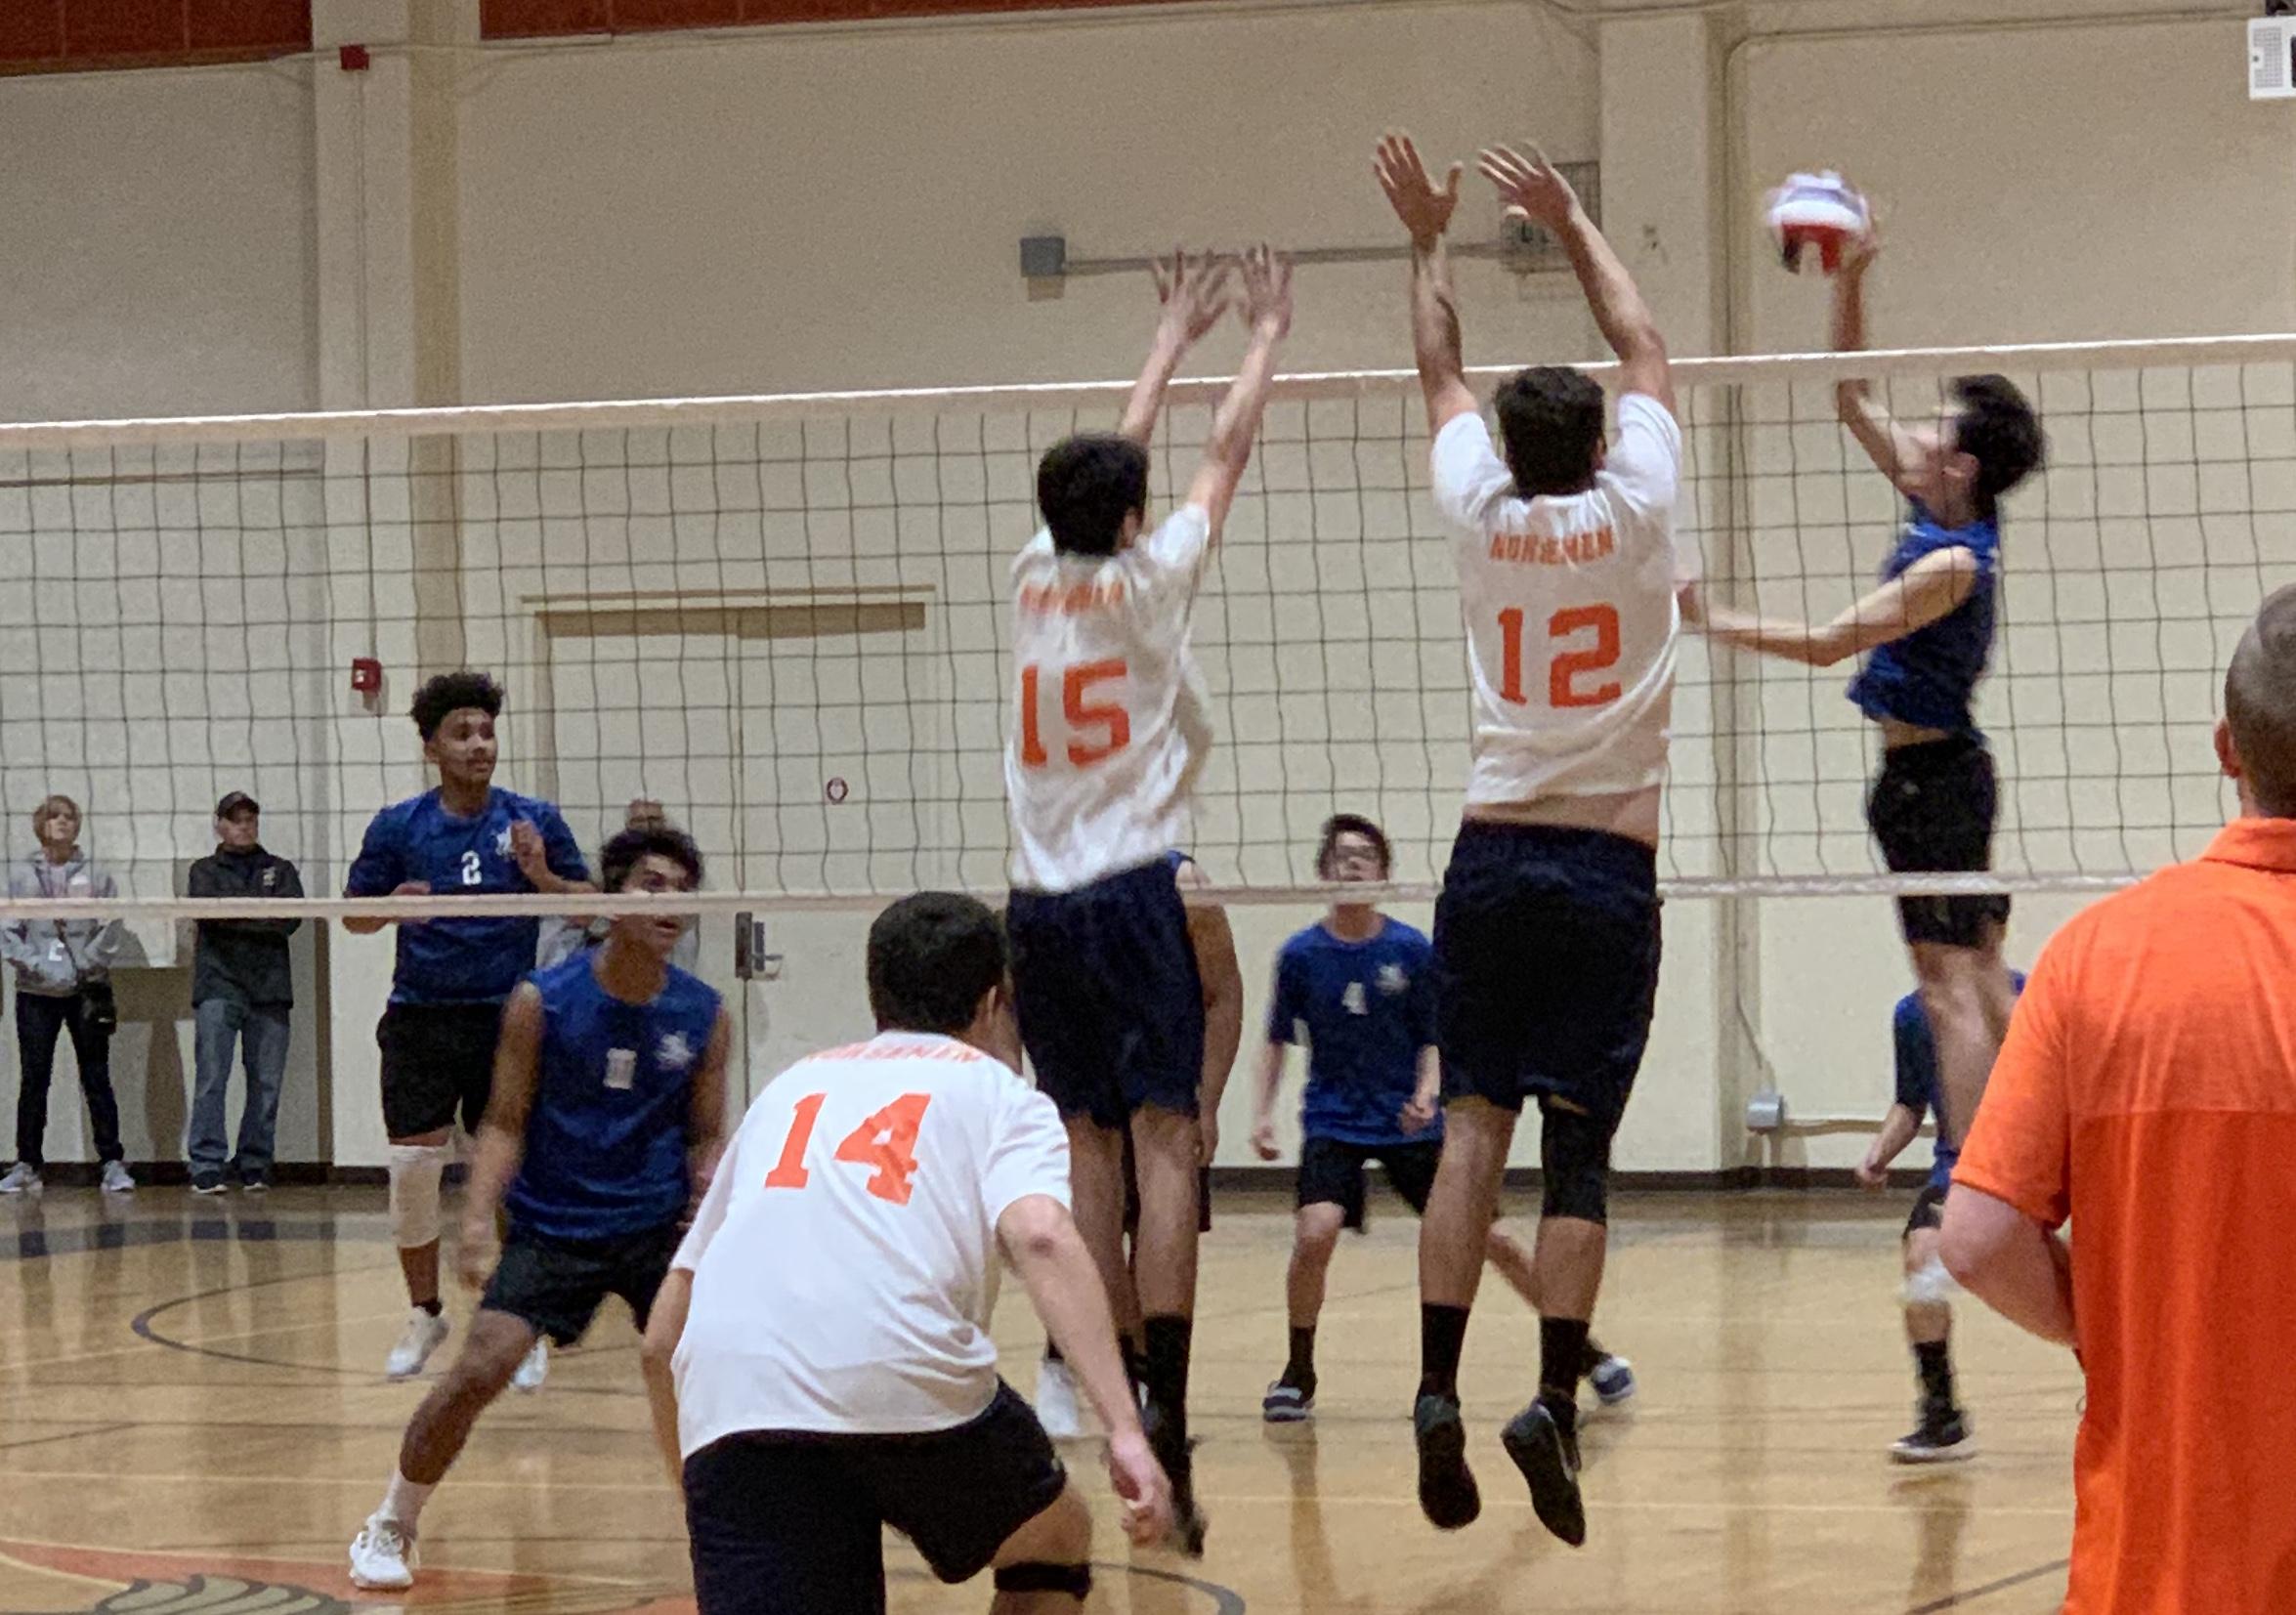 New Men's Volleyball Head Coach – Shayne Hollander